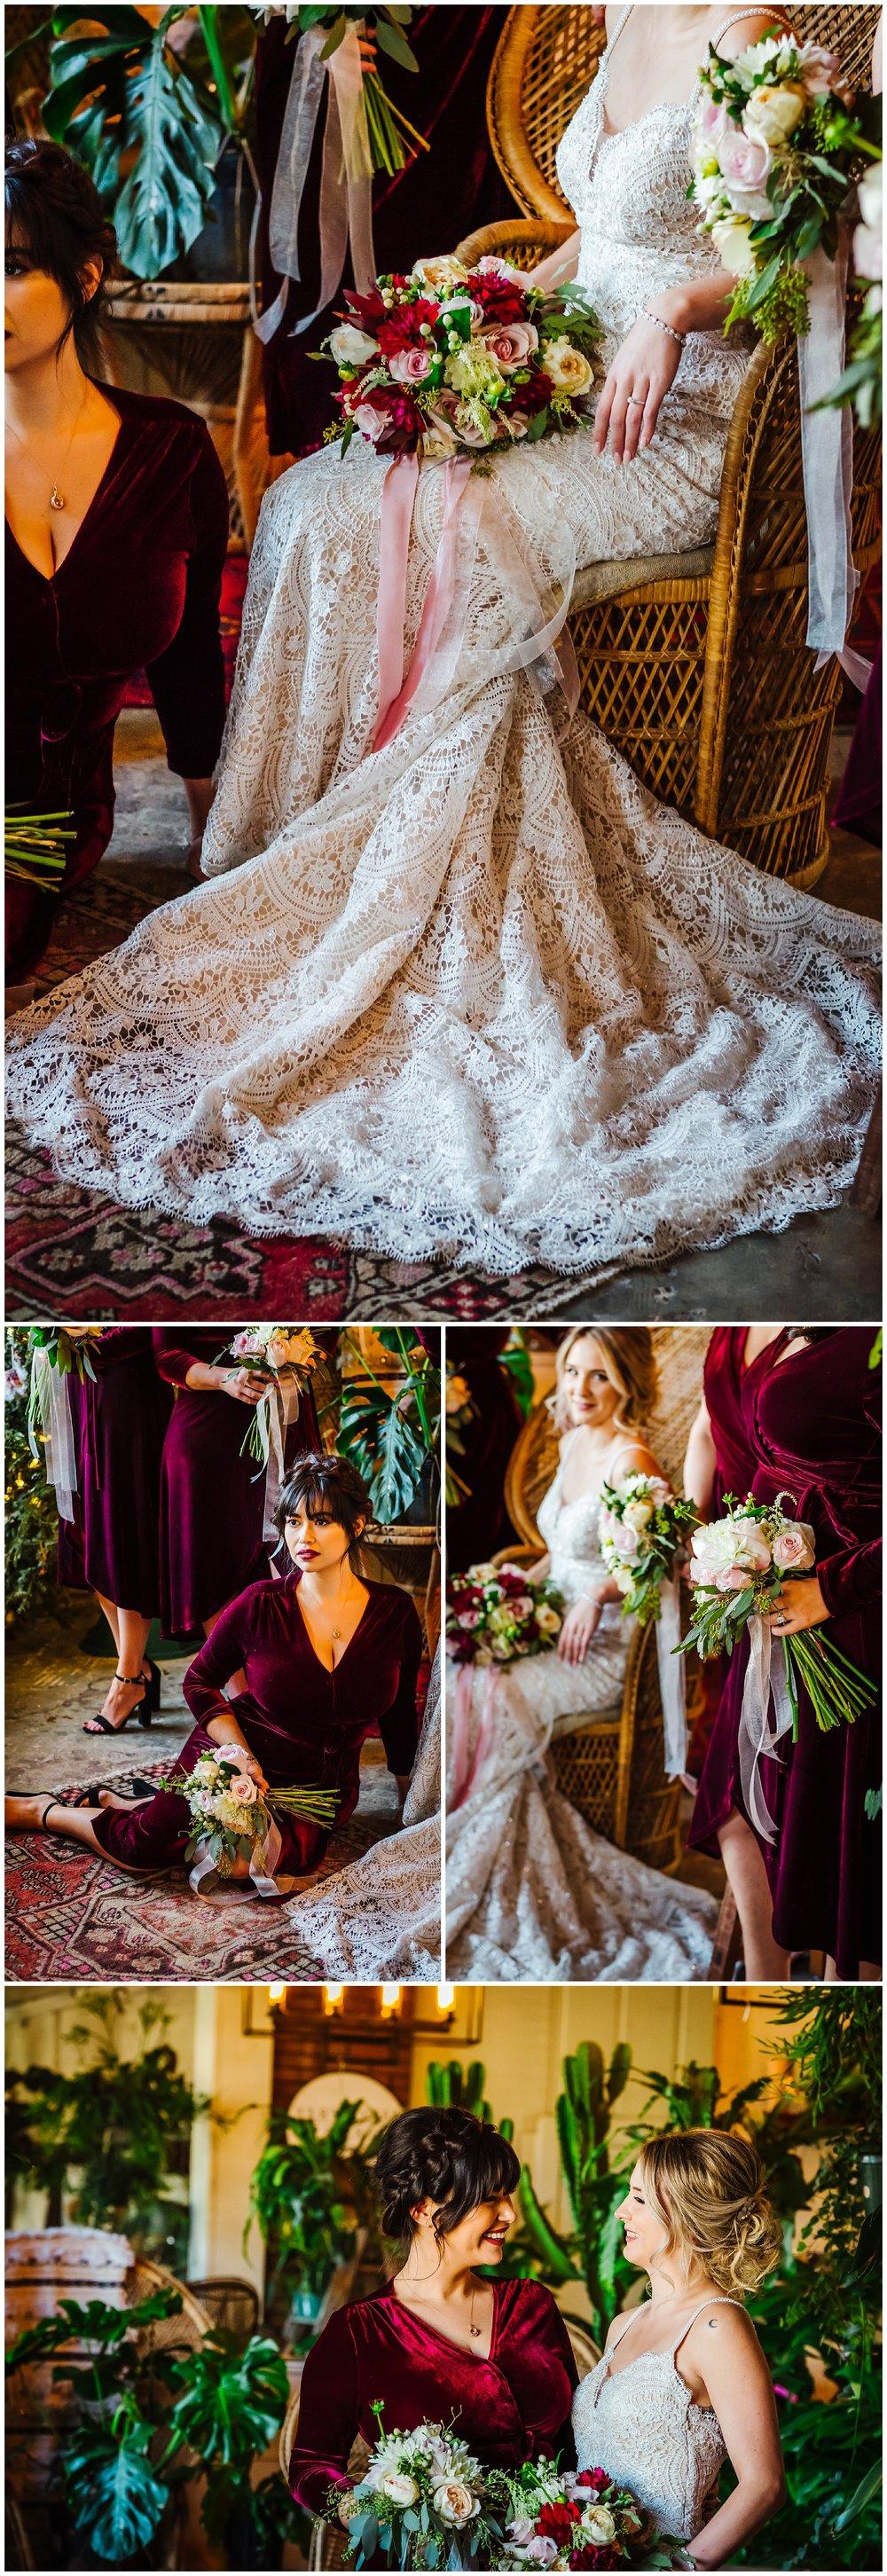 tampa-armeture-wedding-photographer-edgy-industrial-downtown-fancy-free-nursery-tattoo-burgandy-velvet_0034.jpg